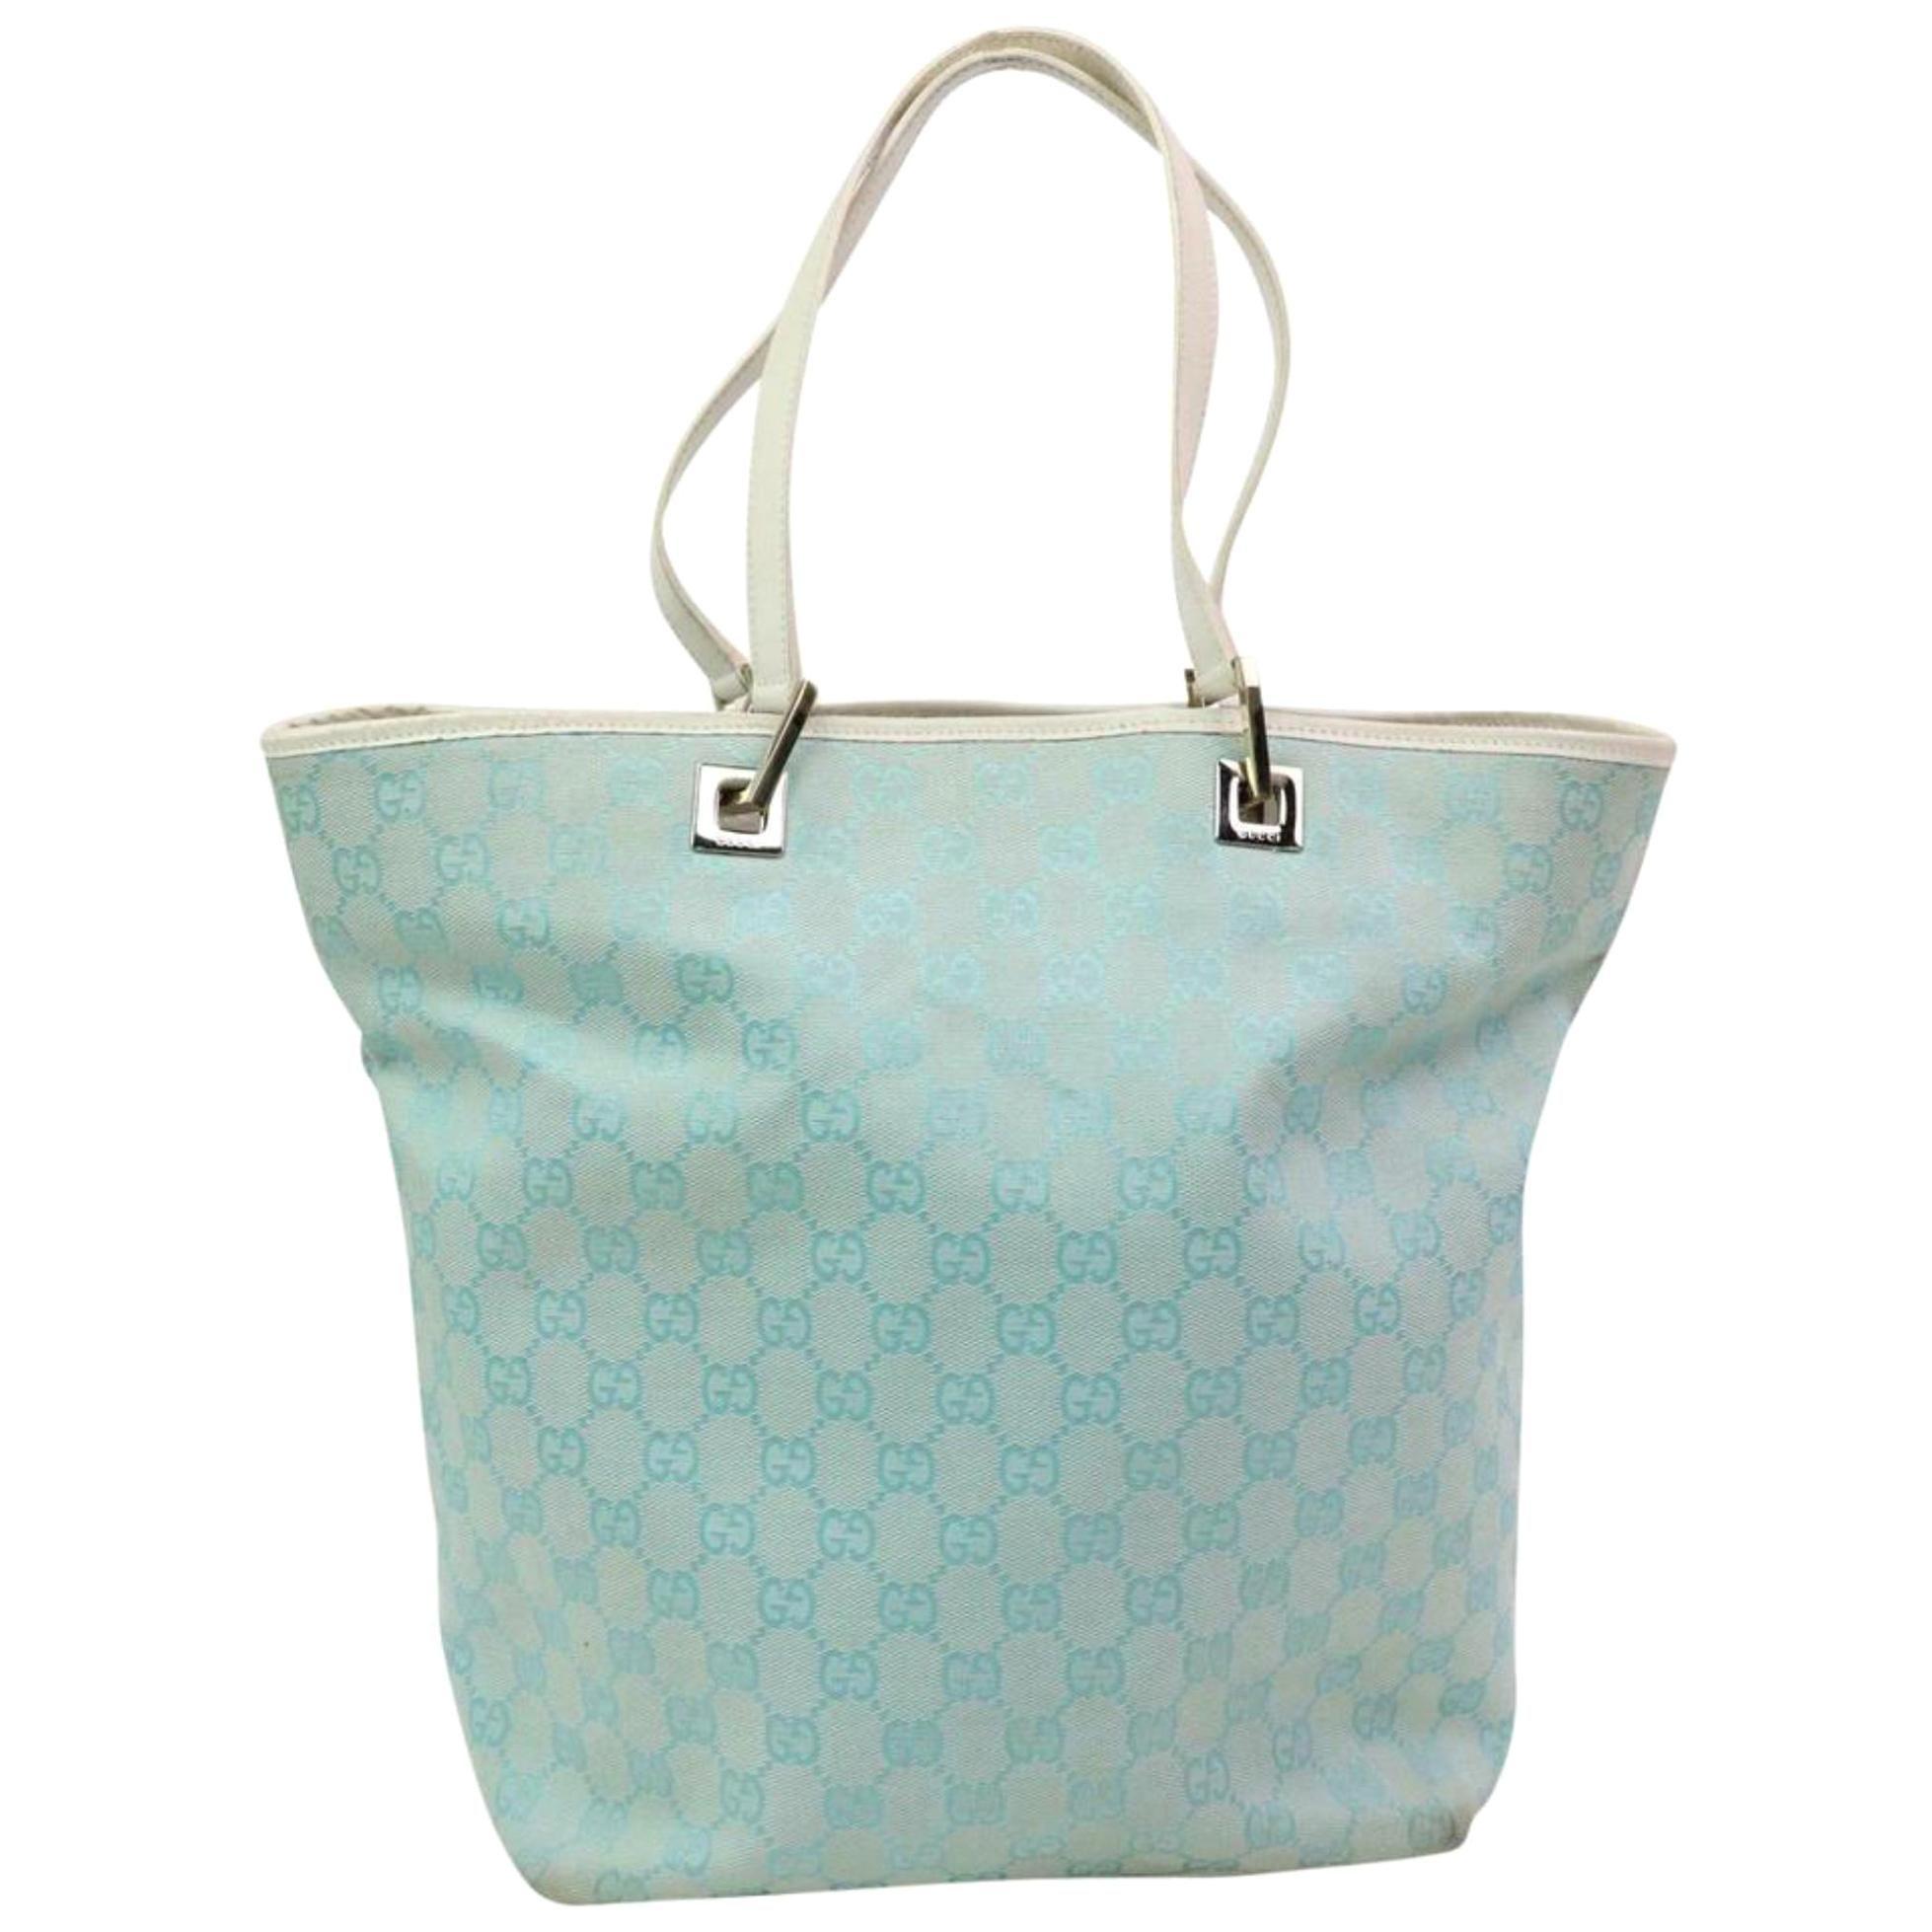 0a9ce05bf7d9 Vintage Gucci Handbags and Purses - 2